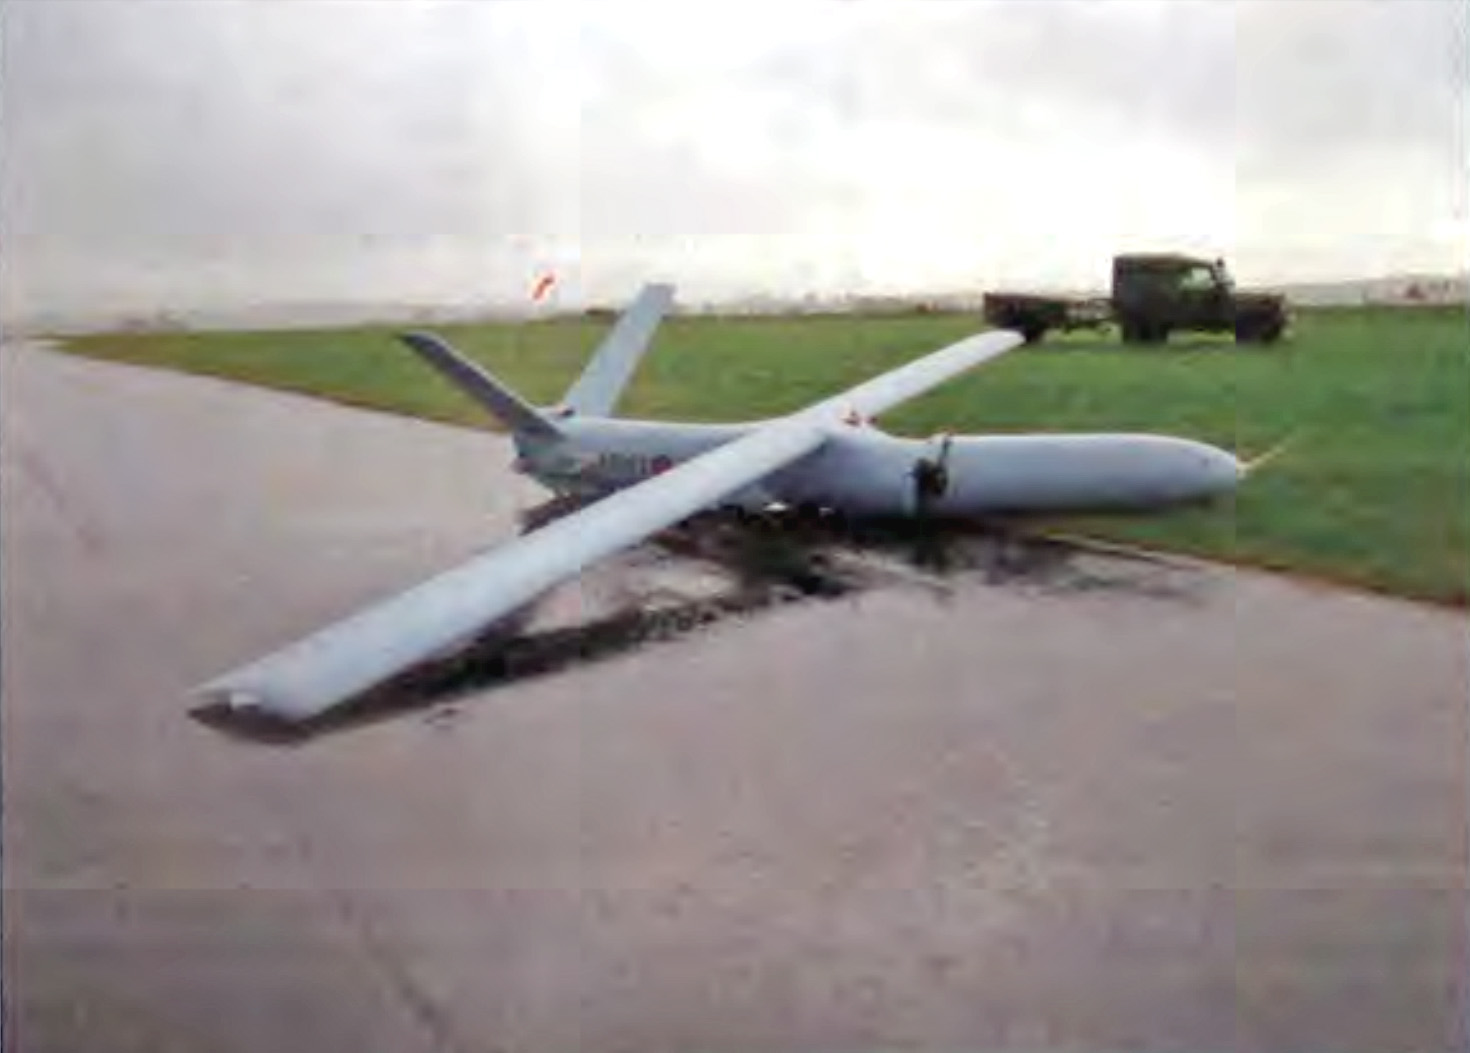 Watchkeeper drone crash